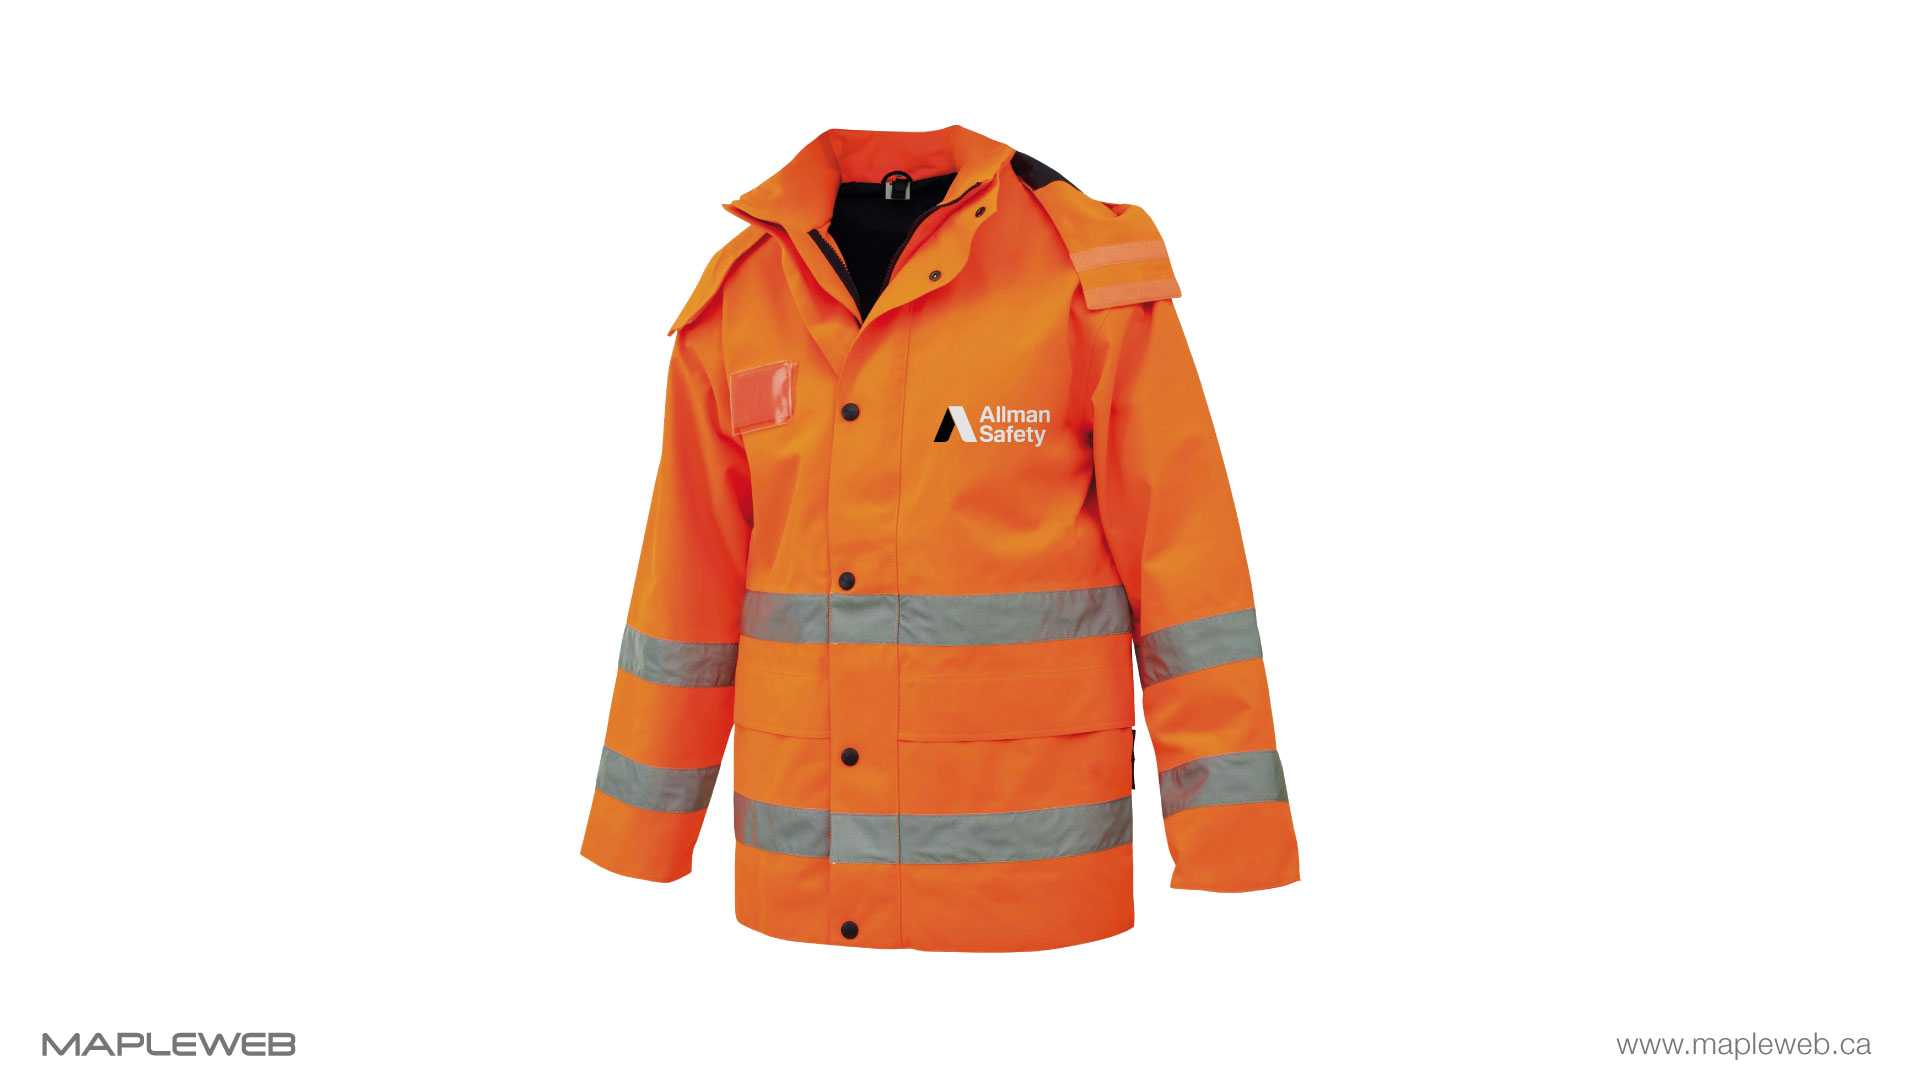 allman-safety-brand-logo-design-by-mapleweb-vancouver-canada-safety-jacket-mock